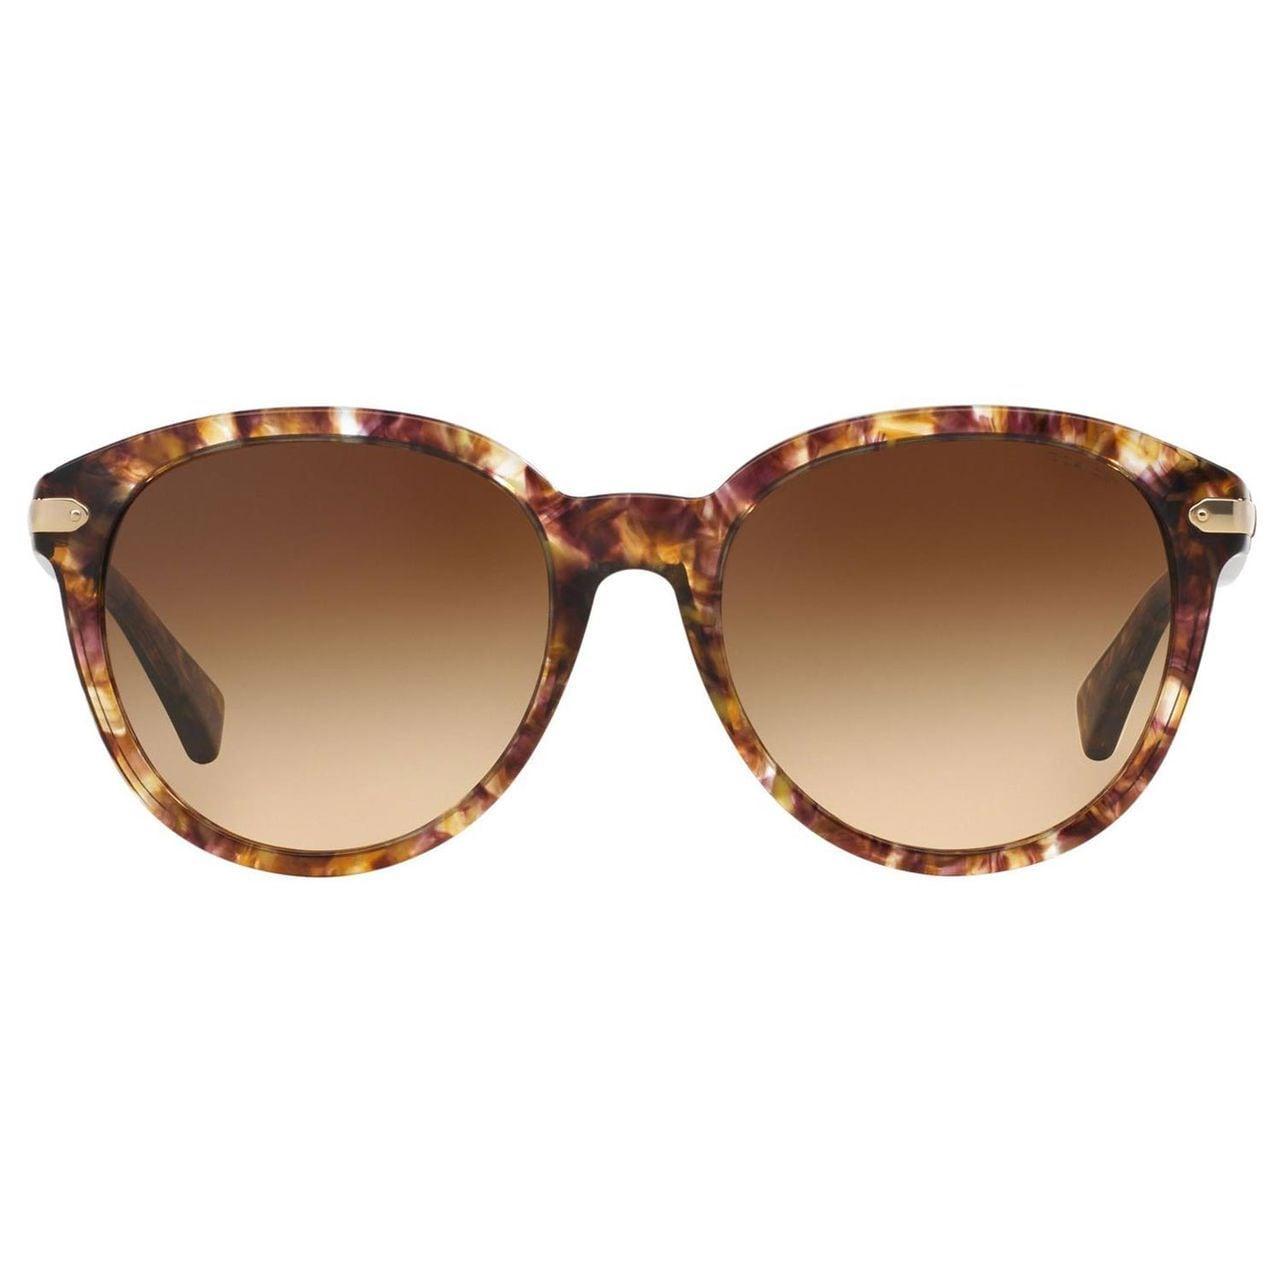 9eaf4dff85 Shop Coach Women s HC8140 L111 528713 Plastic Phantos Sunglasses - Brown -  Free Shipping Today - Overstock.com - 10305220